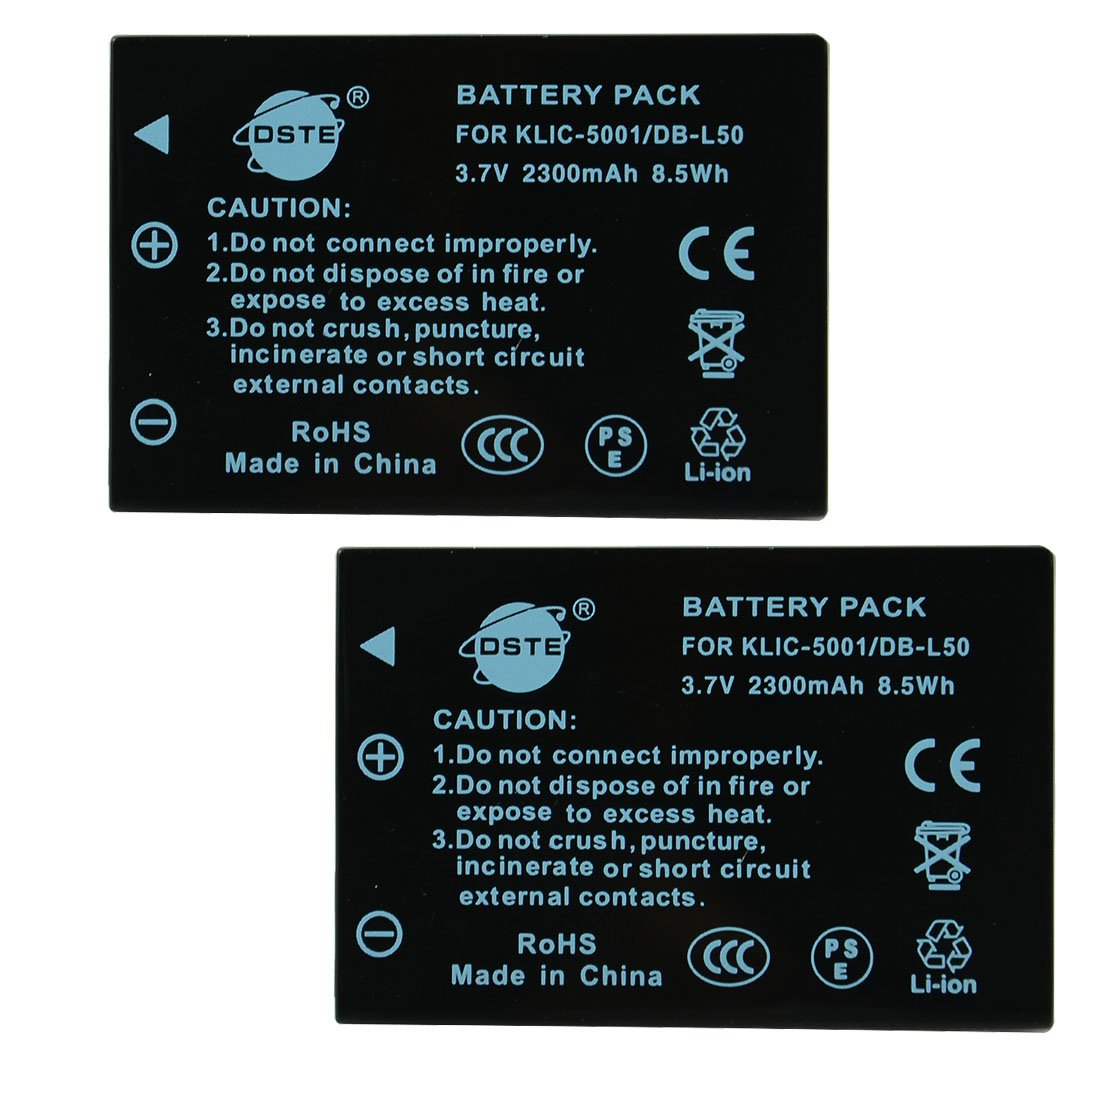 2 x Ex-Pro Battery KLIC-5001 for Kodak Easyshare Z7590 P850 P880 P712 DX7590